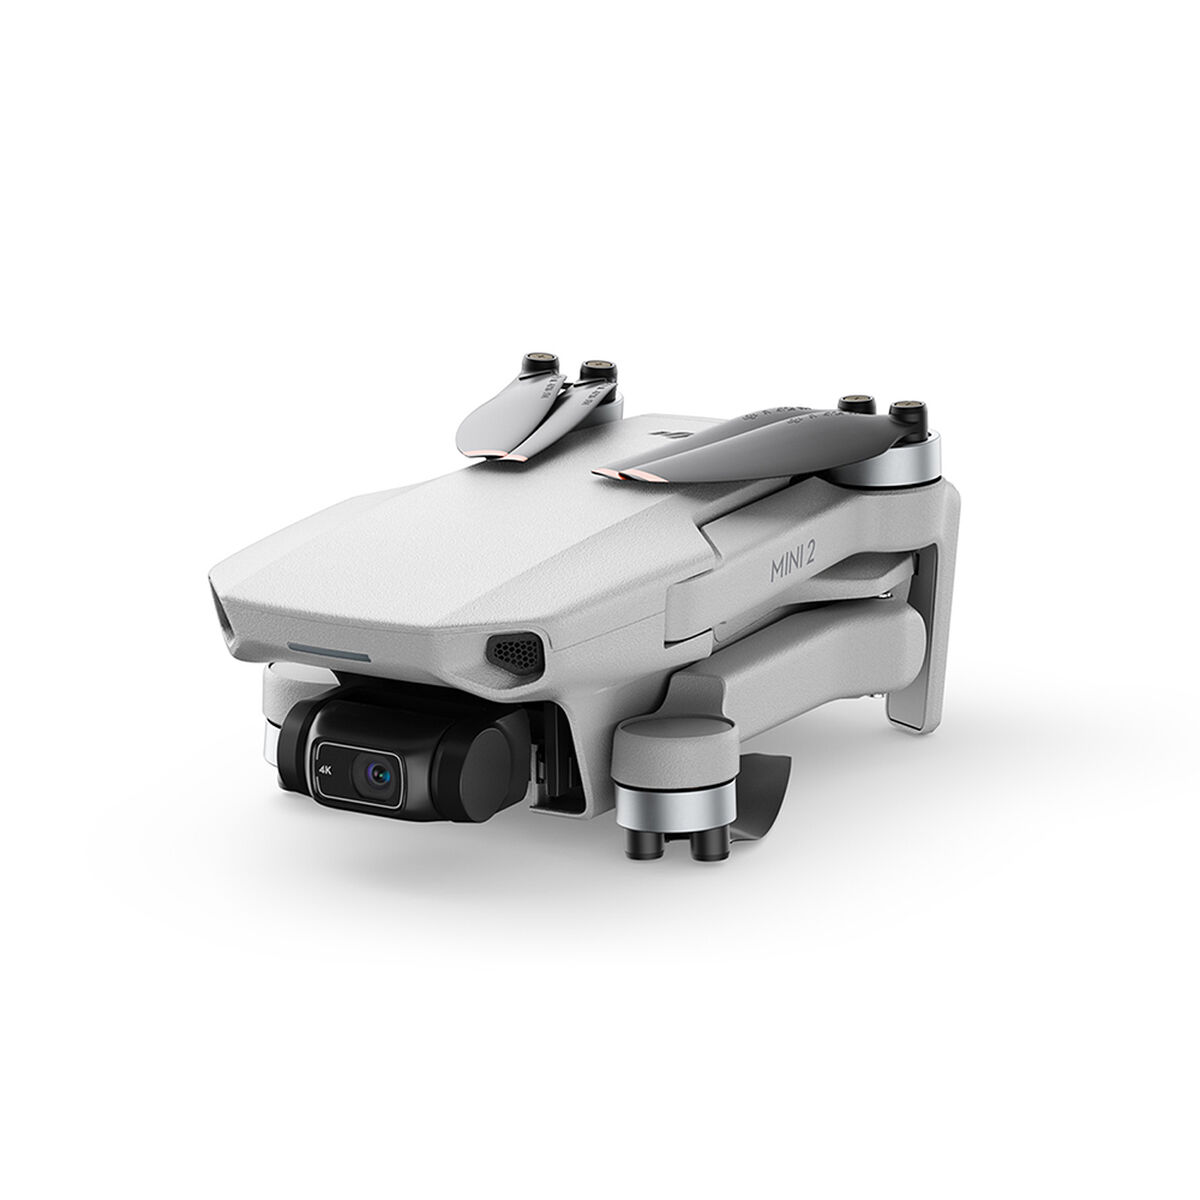 Drone DJI Mavic Mini 2 Fly More Combo Blanco